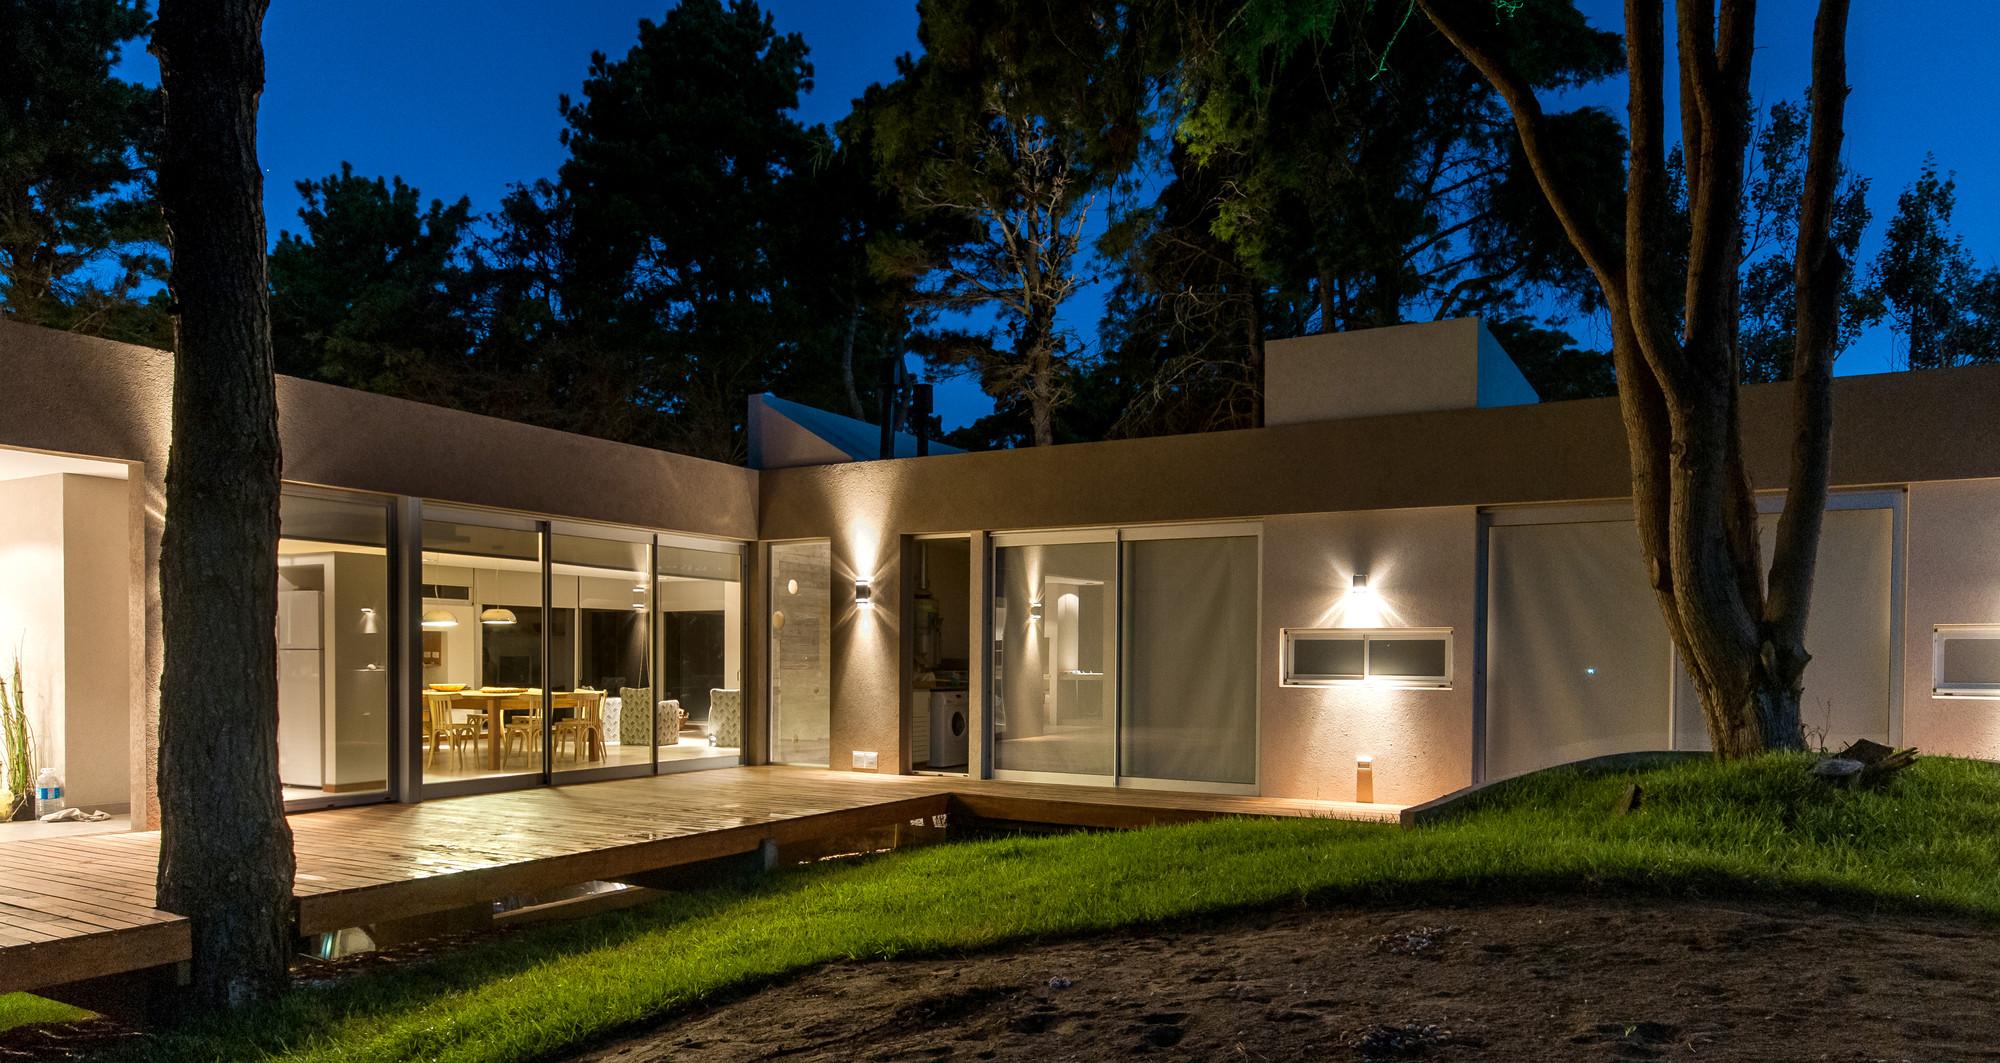 Galeria de casa kaprys galera estudio 2 for Casa a forma di u con cortile